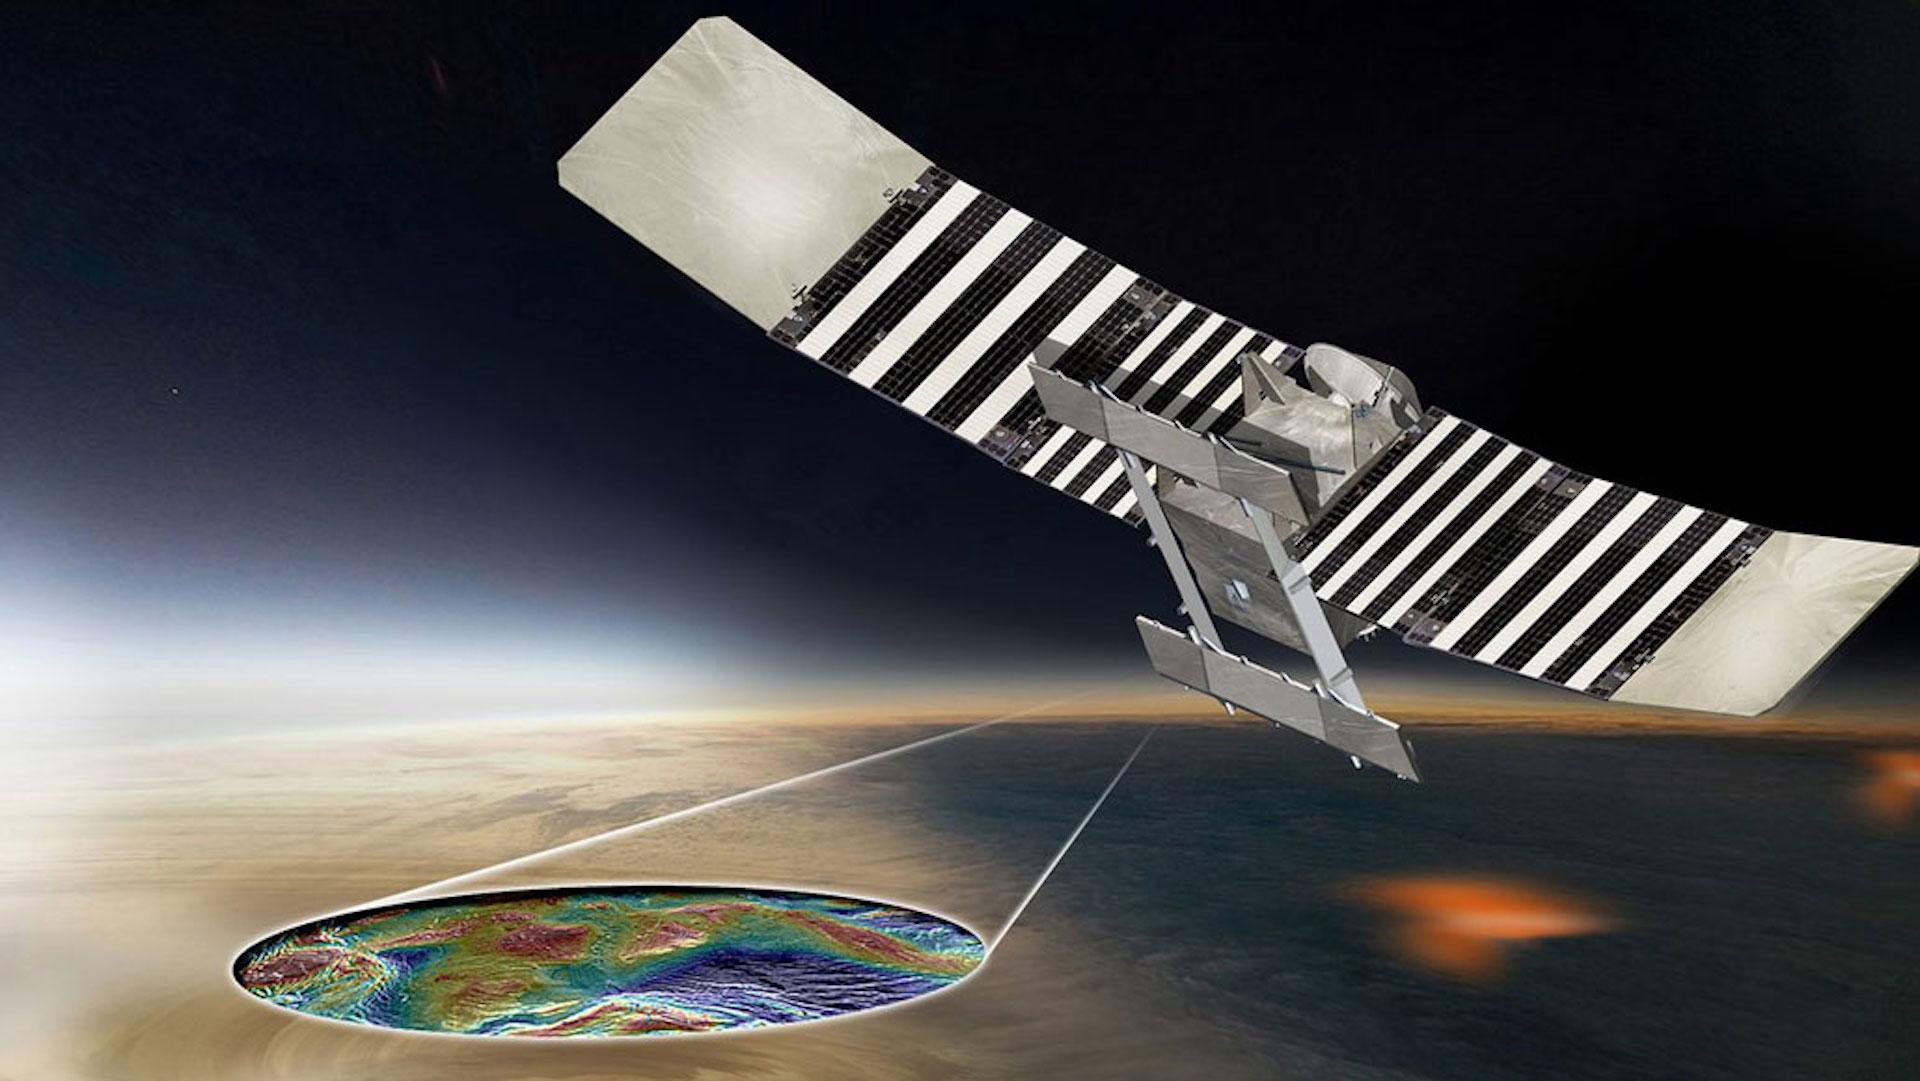 Illustration of proposed Veritas spacecraft measuring subsurface features of Venus.